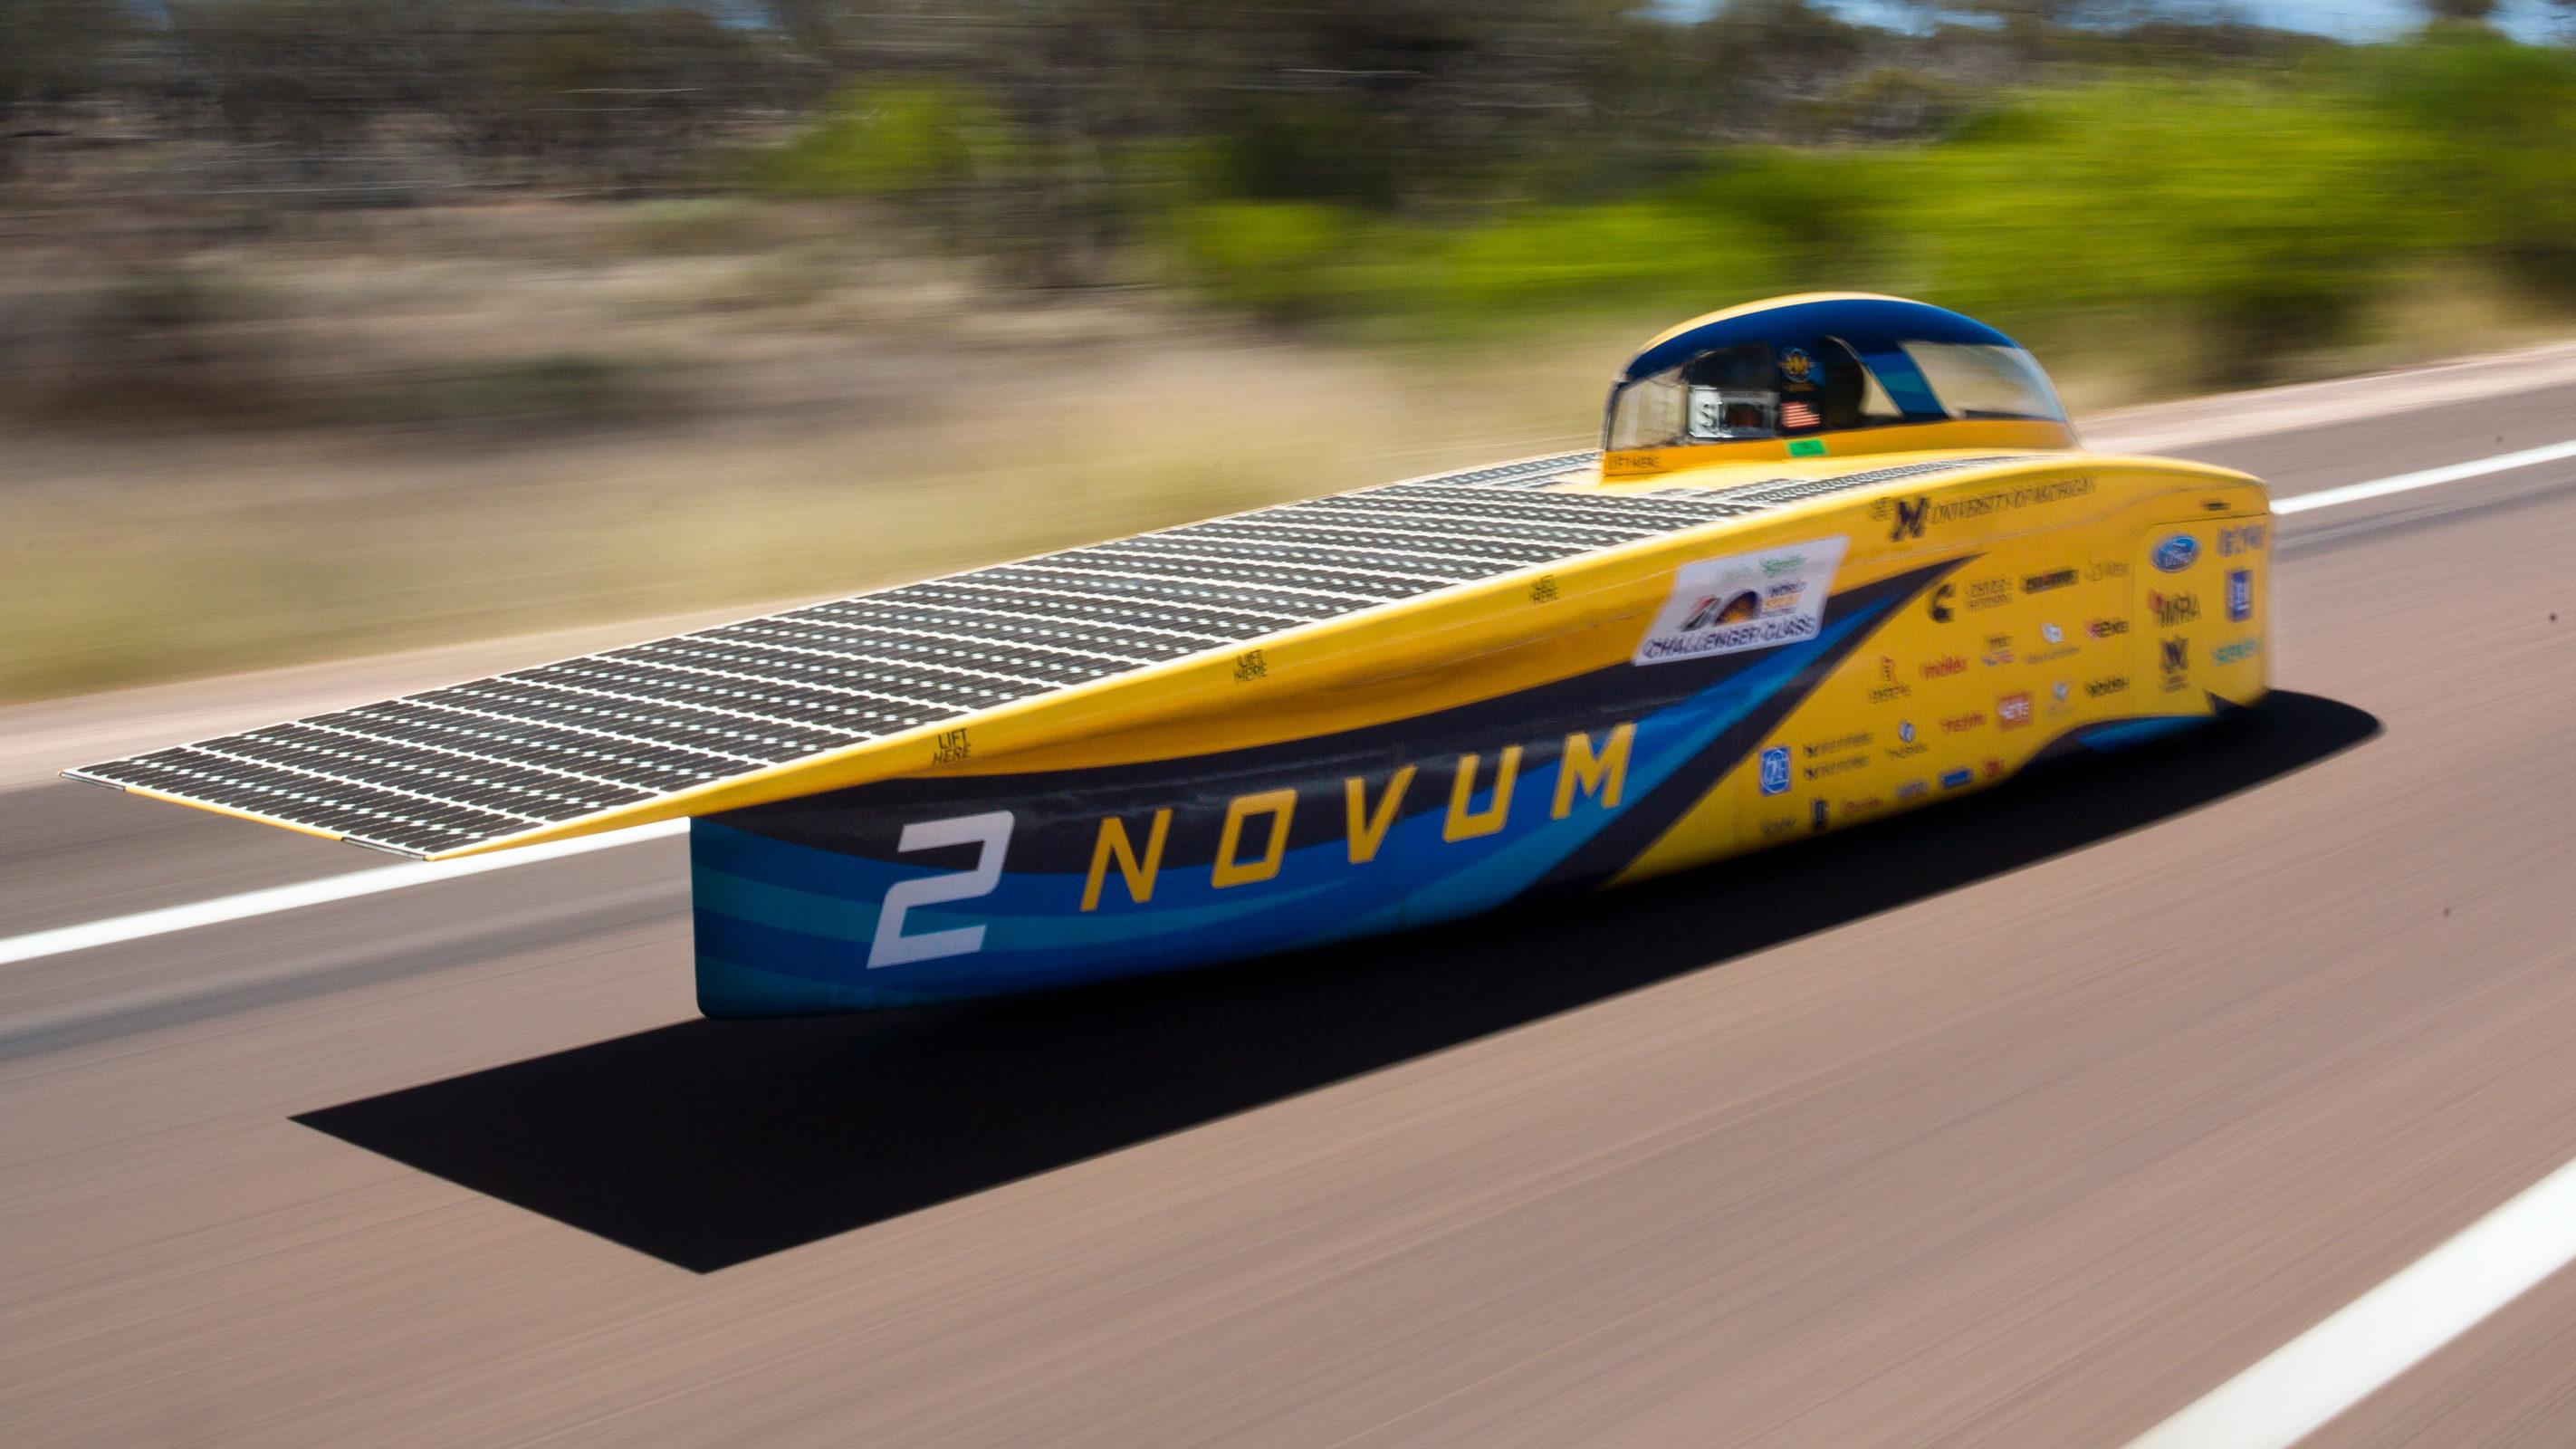 Solar car racing on road in Australia.